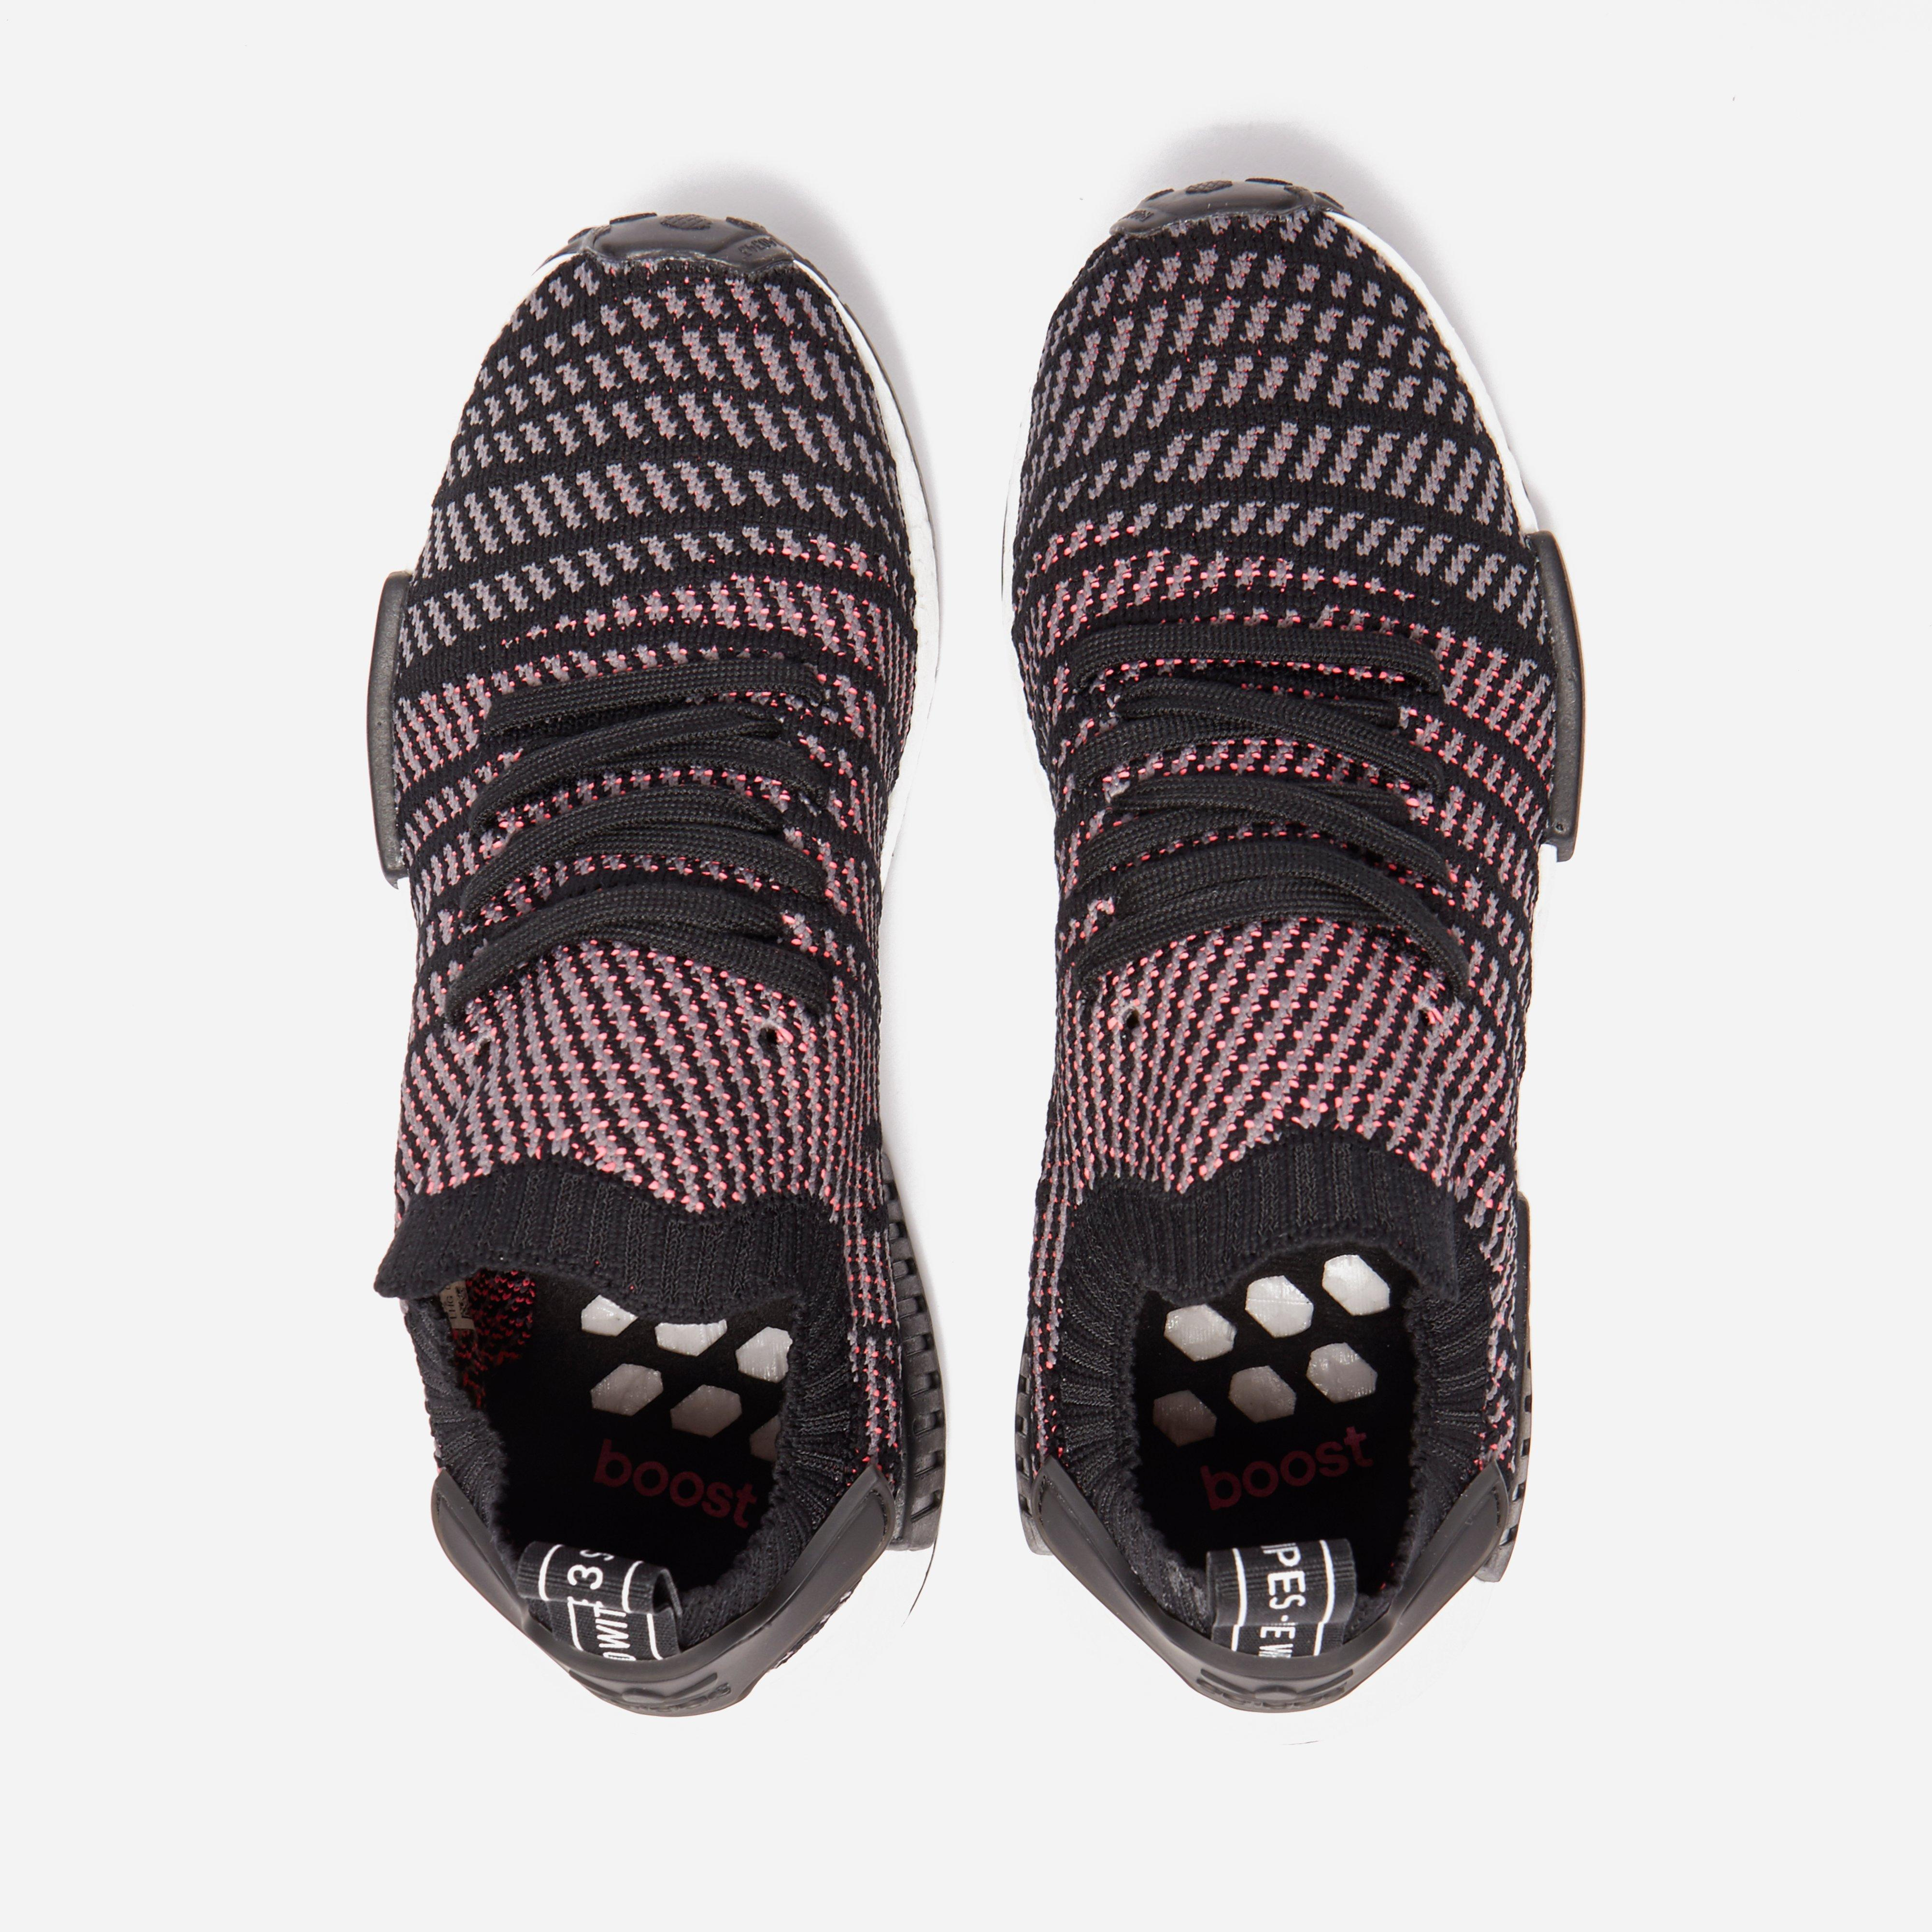 52564a3c20131 Adidas Originals Nmd R1 Stlt Pk in Black for Men - Lyst